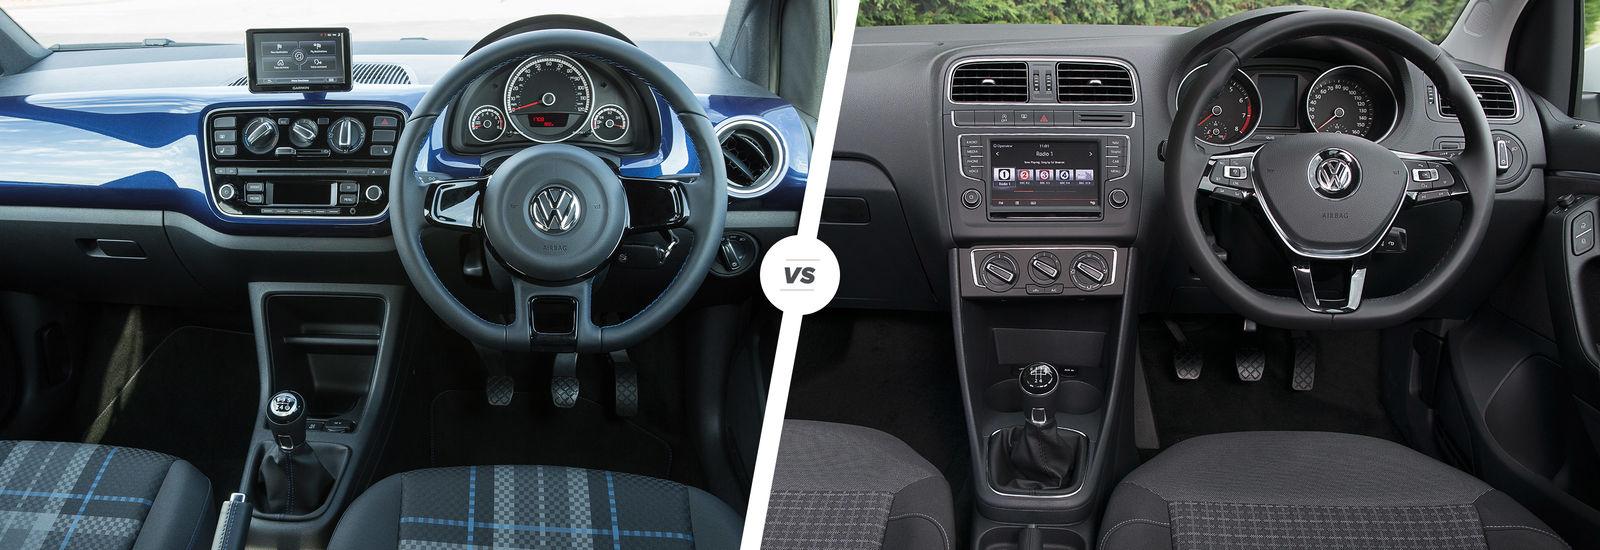 Volkswagen Up vs Polo – city car vs supermini | carwow